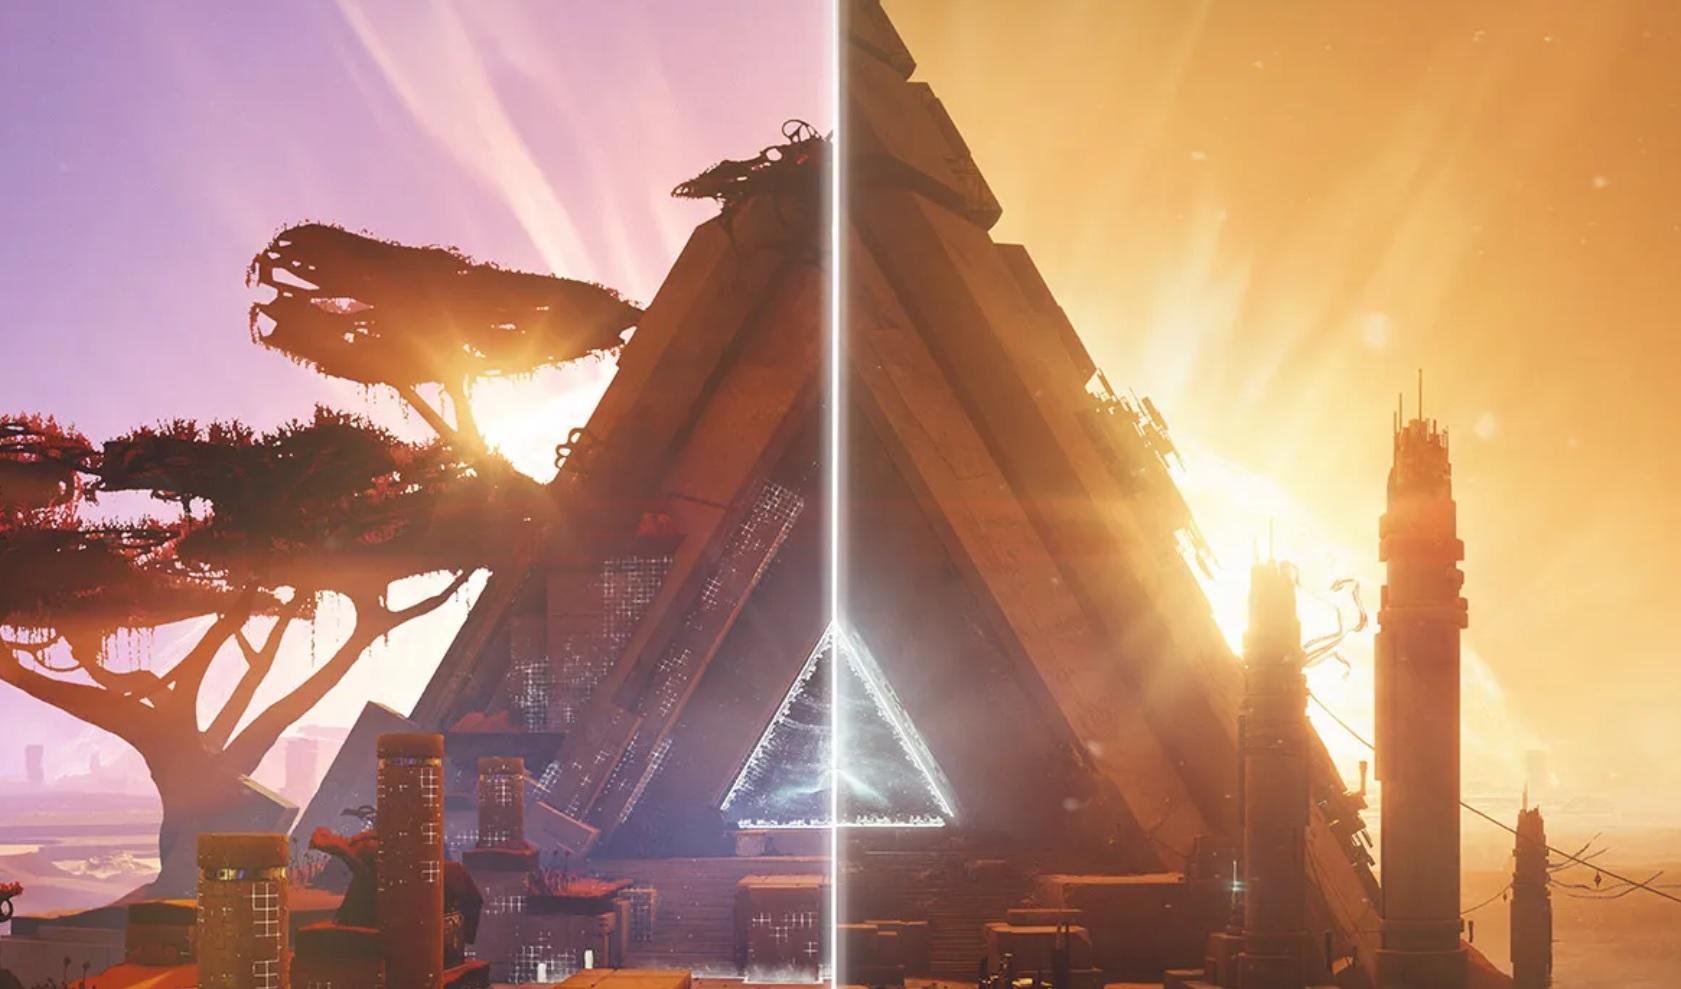 Bungie unveils its ambitious plans for Destiny 2's Season of Dawn